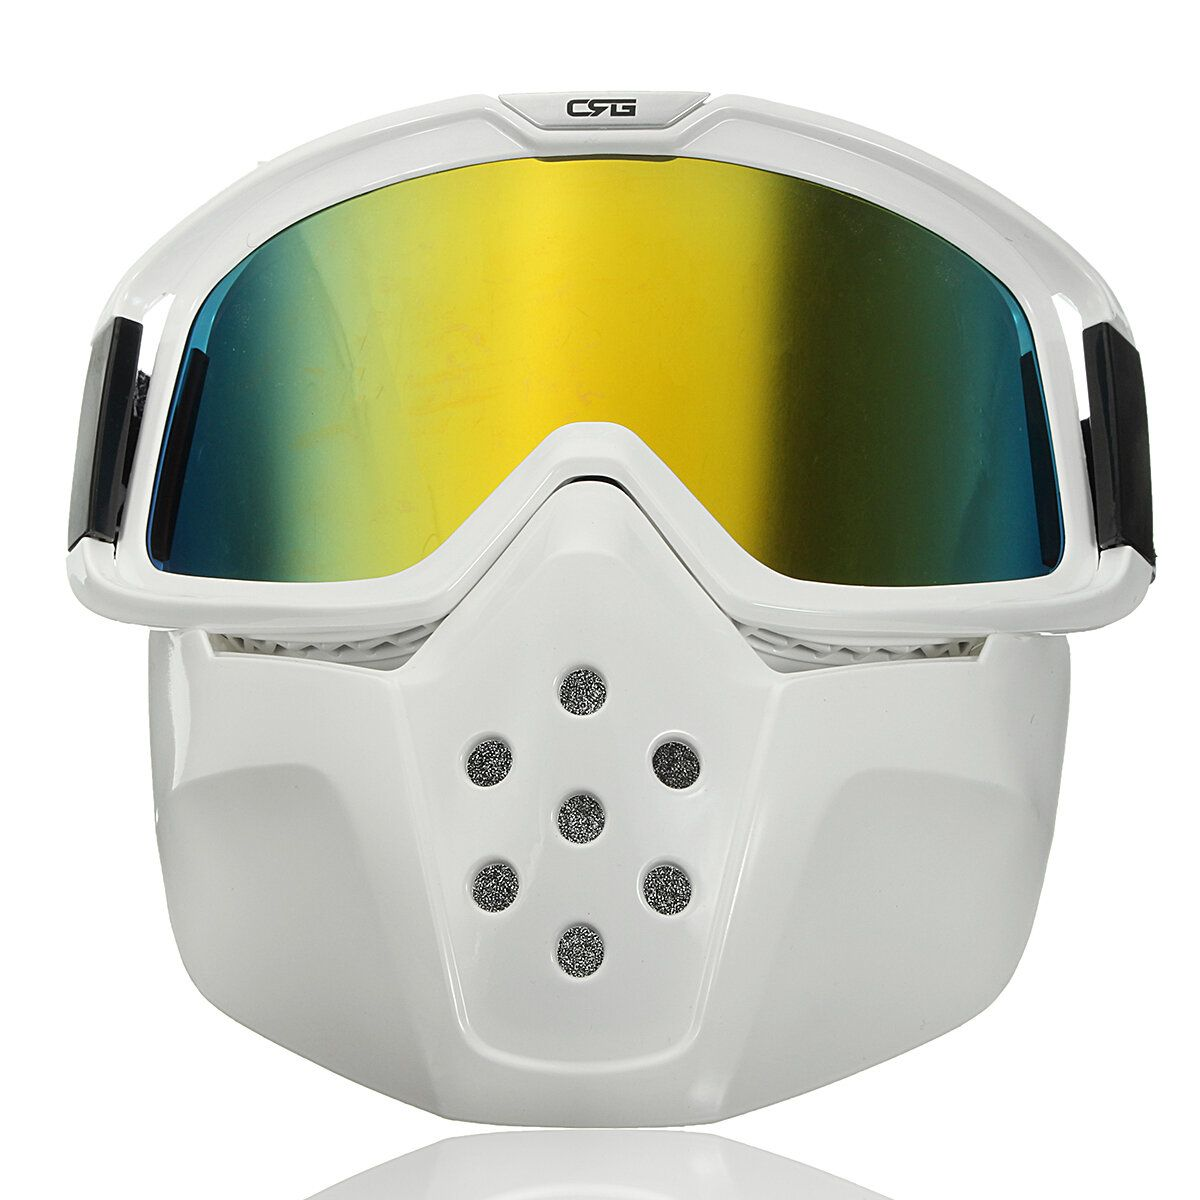 NBH US$27.31 Detachable Modular Face Mask Shield Goggles Riding Motorcycle Helmet Yellow Lens